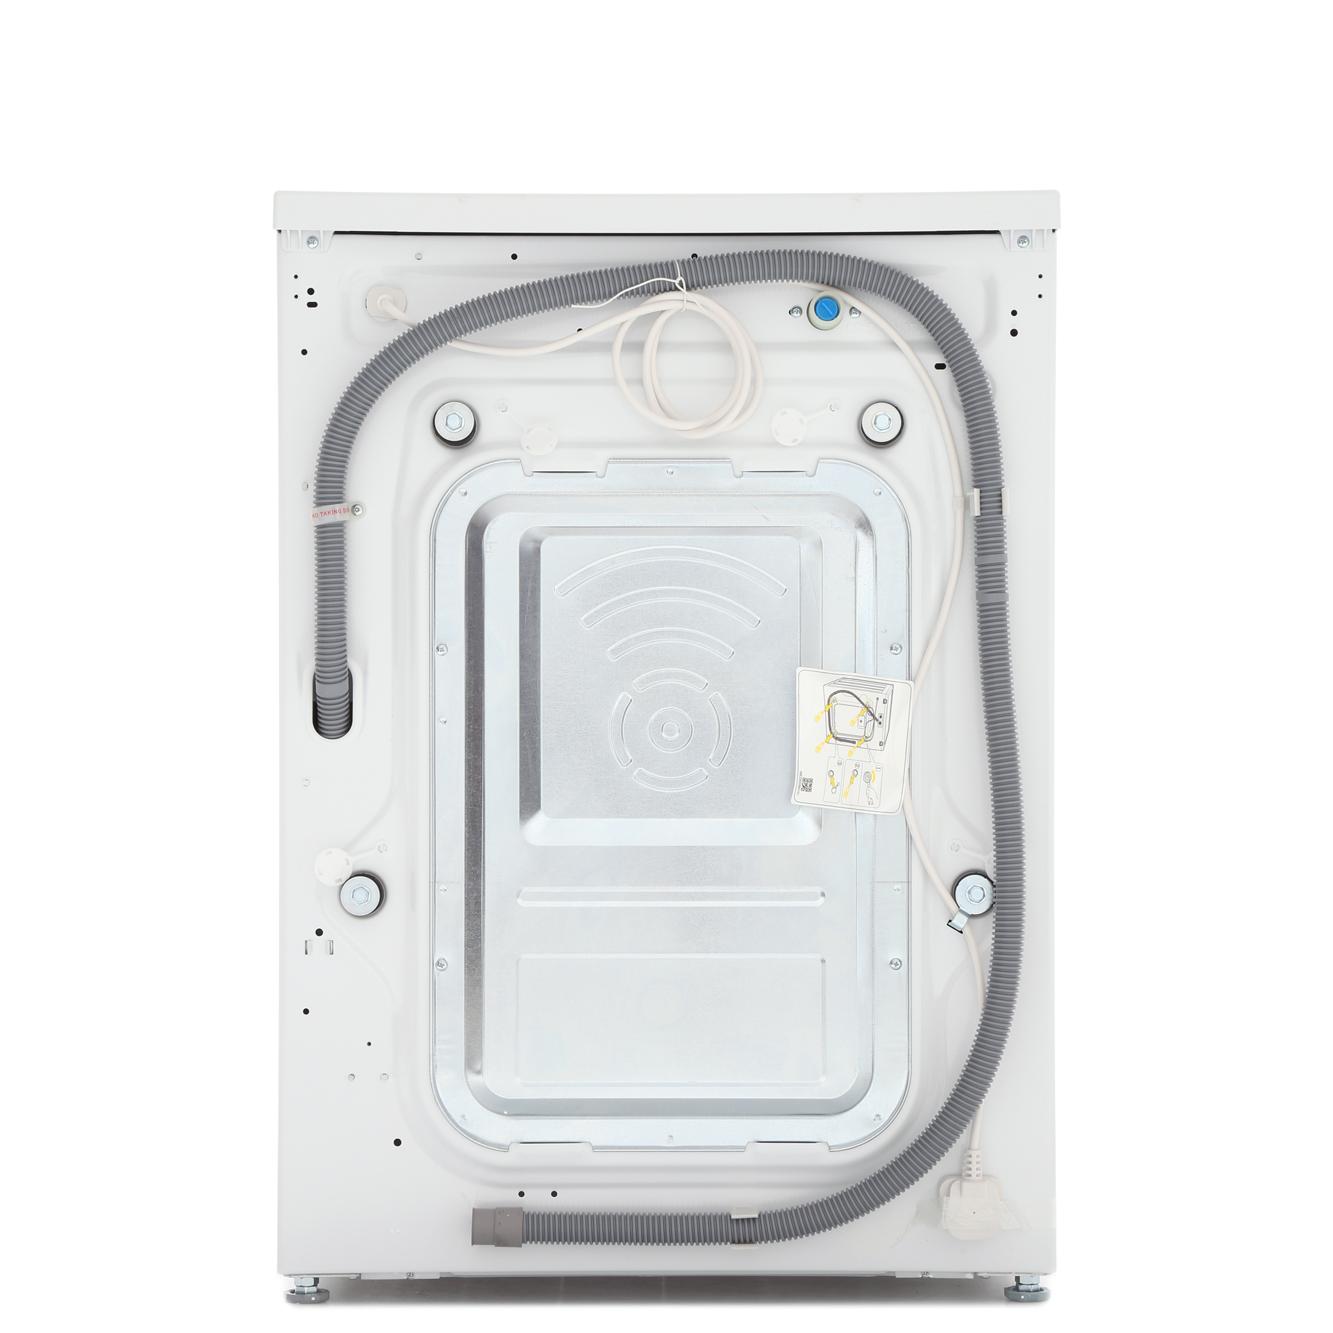 buy lg 6 motion direct drive f1496tda washing machine. Black Bedroom Furniture Sets. Home Design Ideas